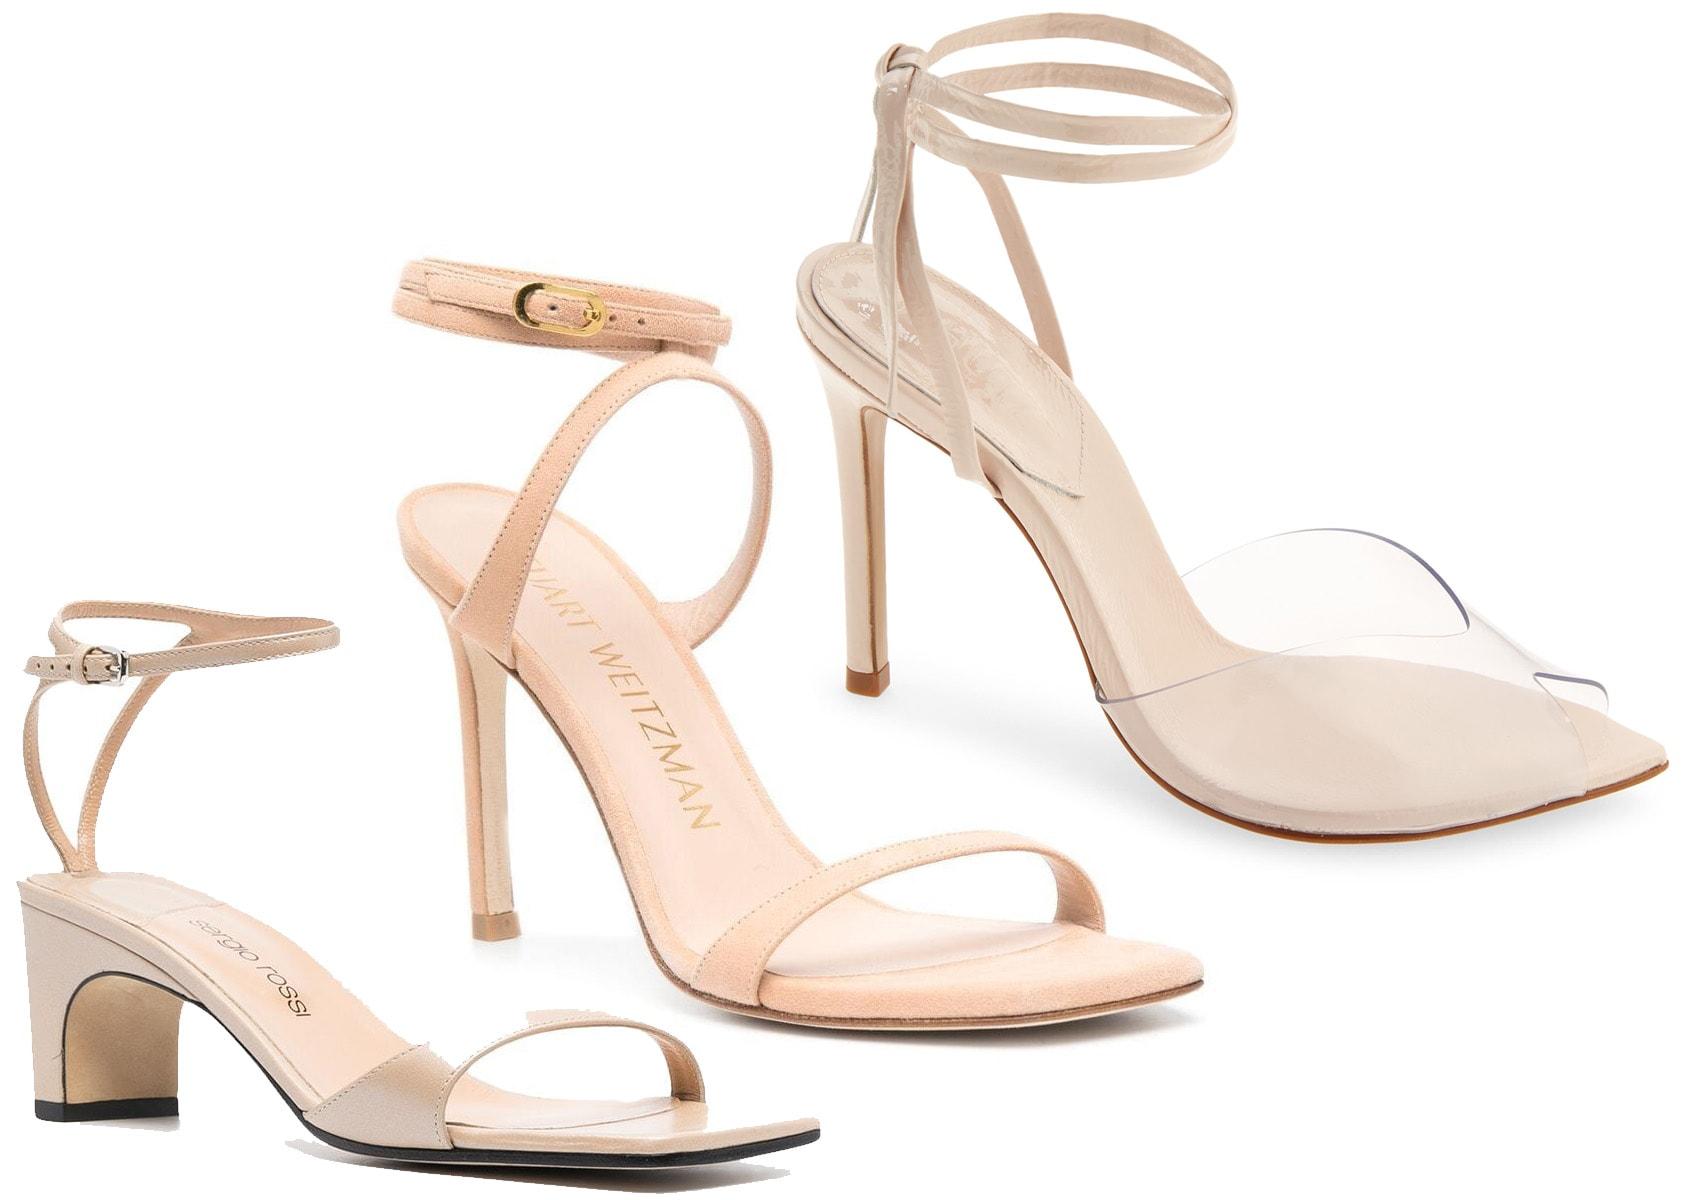 Sergio Rossi Ankle-Strap Sandal, Stuart Weitzman Ellsie Strappy Sandal, Schutz Desta Sandal